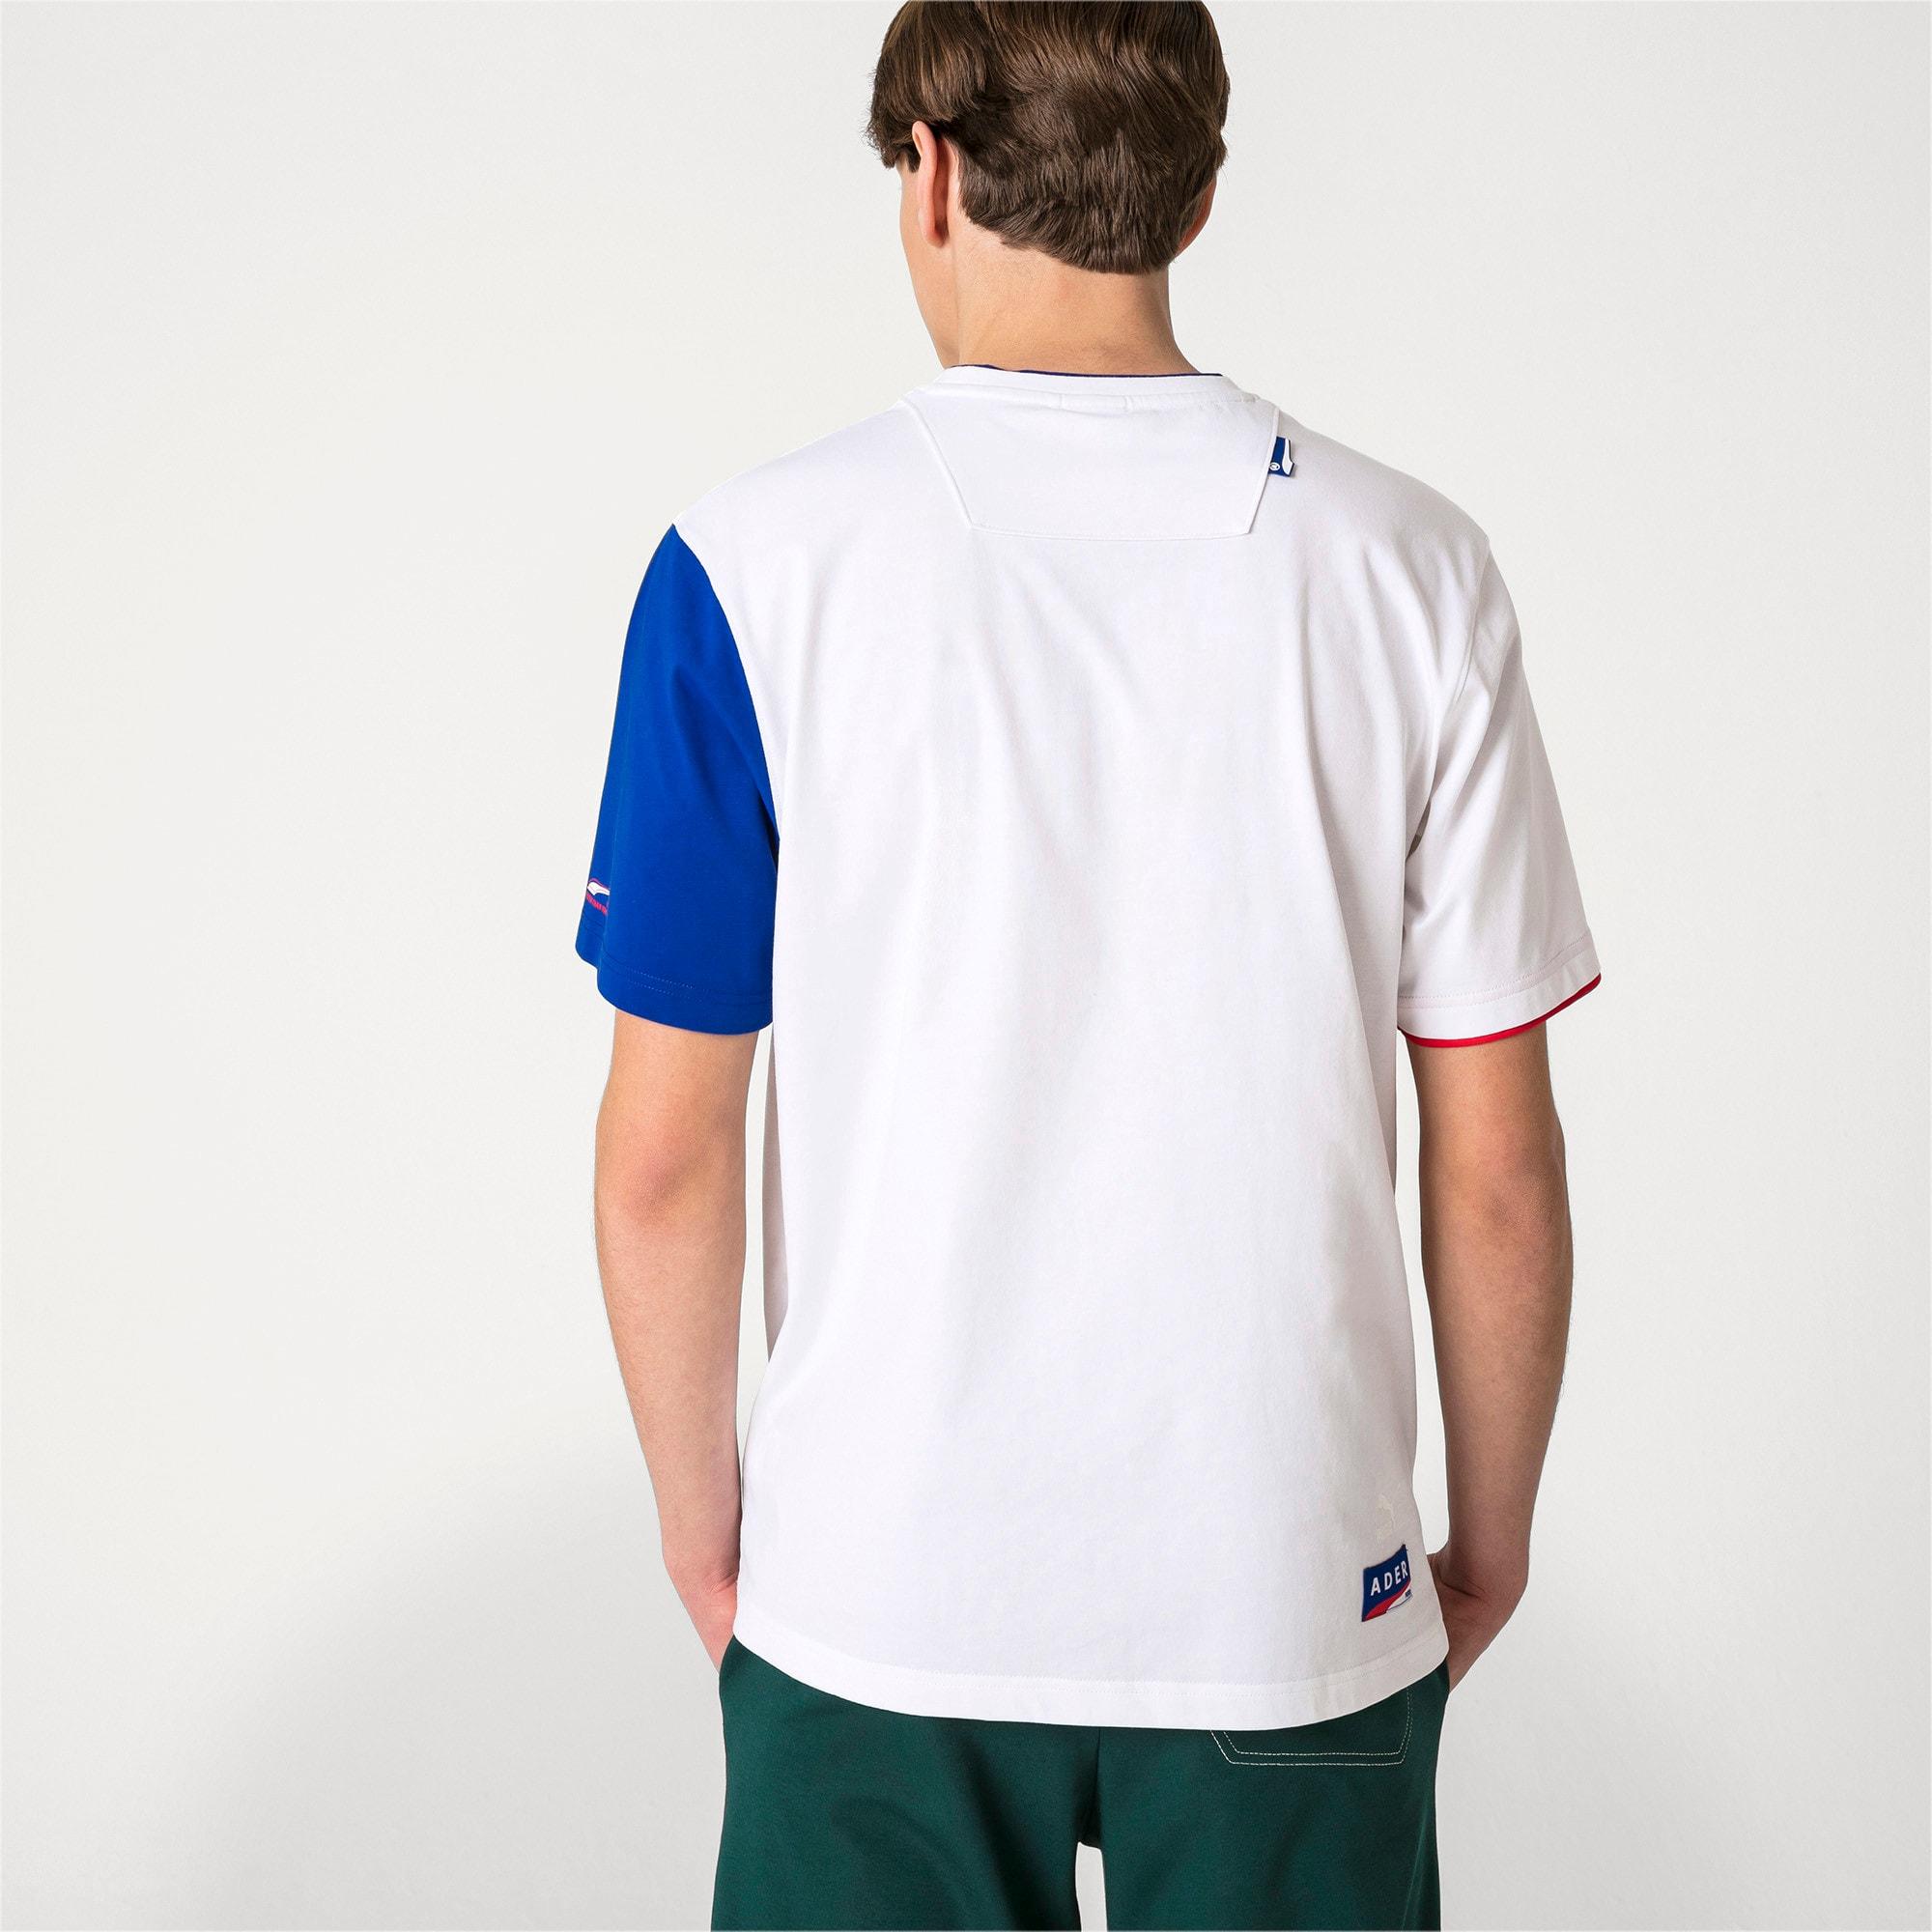 Thumbnail 3 of PUMA x ADER T-Shirt, Puma White, medium